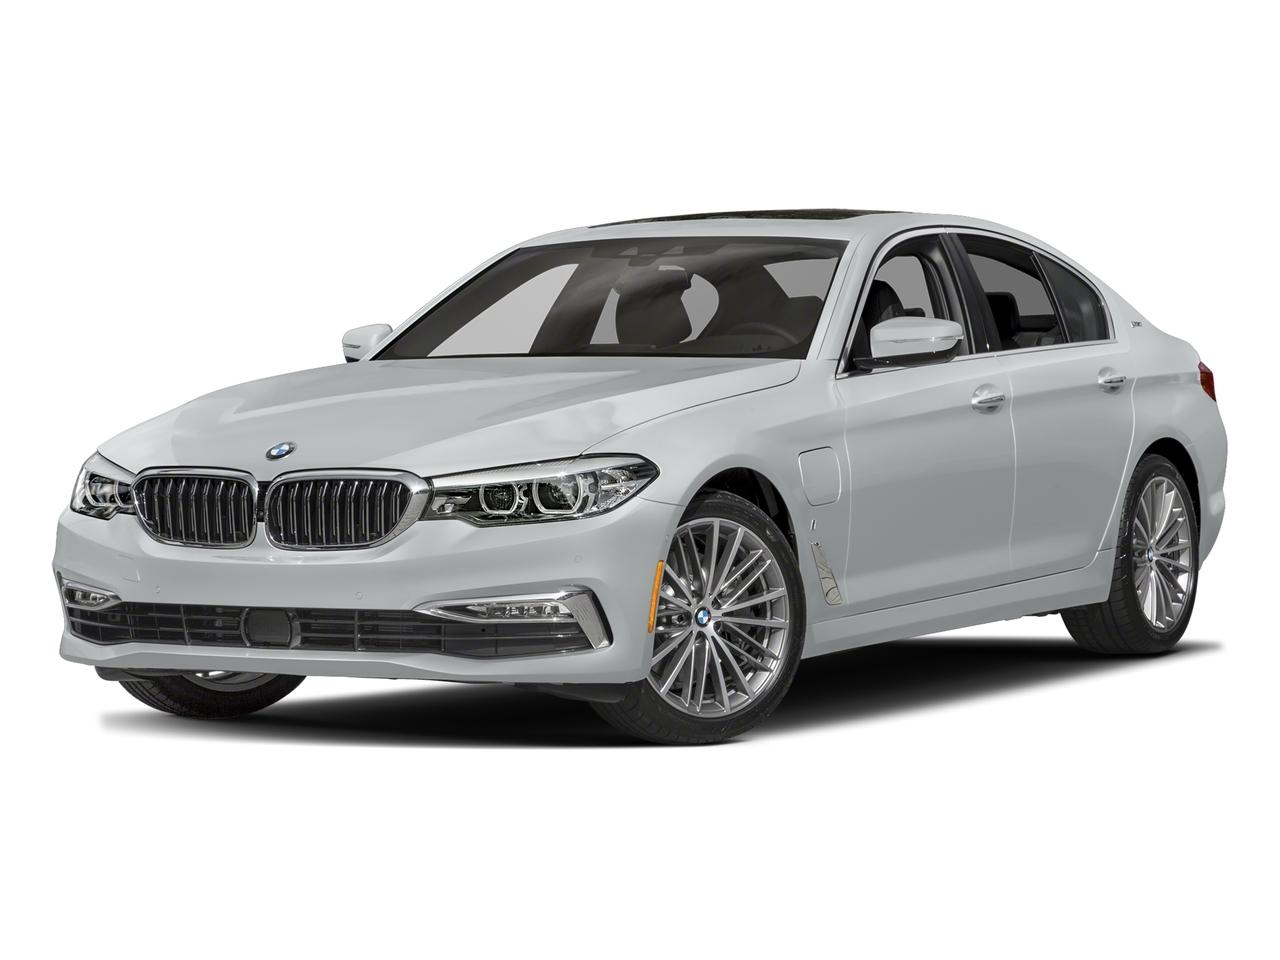 2018 BMW 530e iPerformance Vehicle Photo in Pleasanton, CA 94588